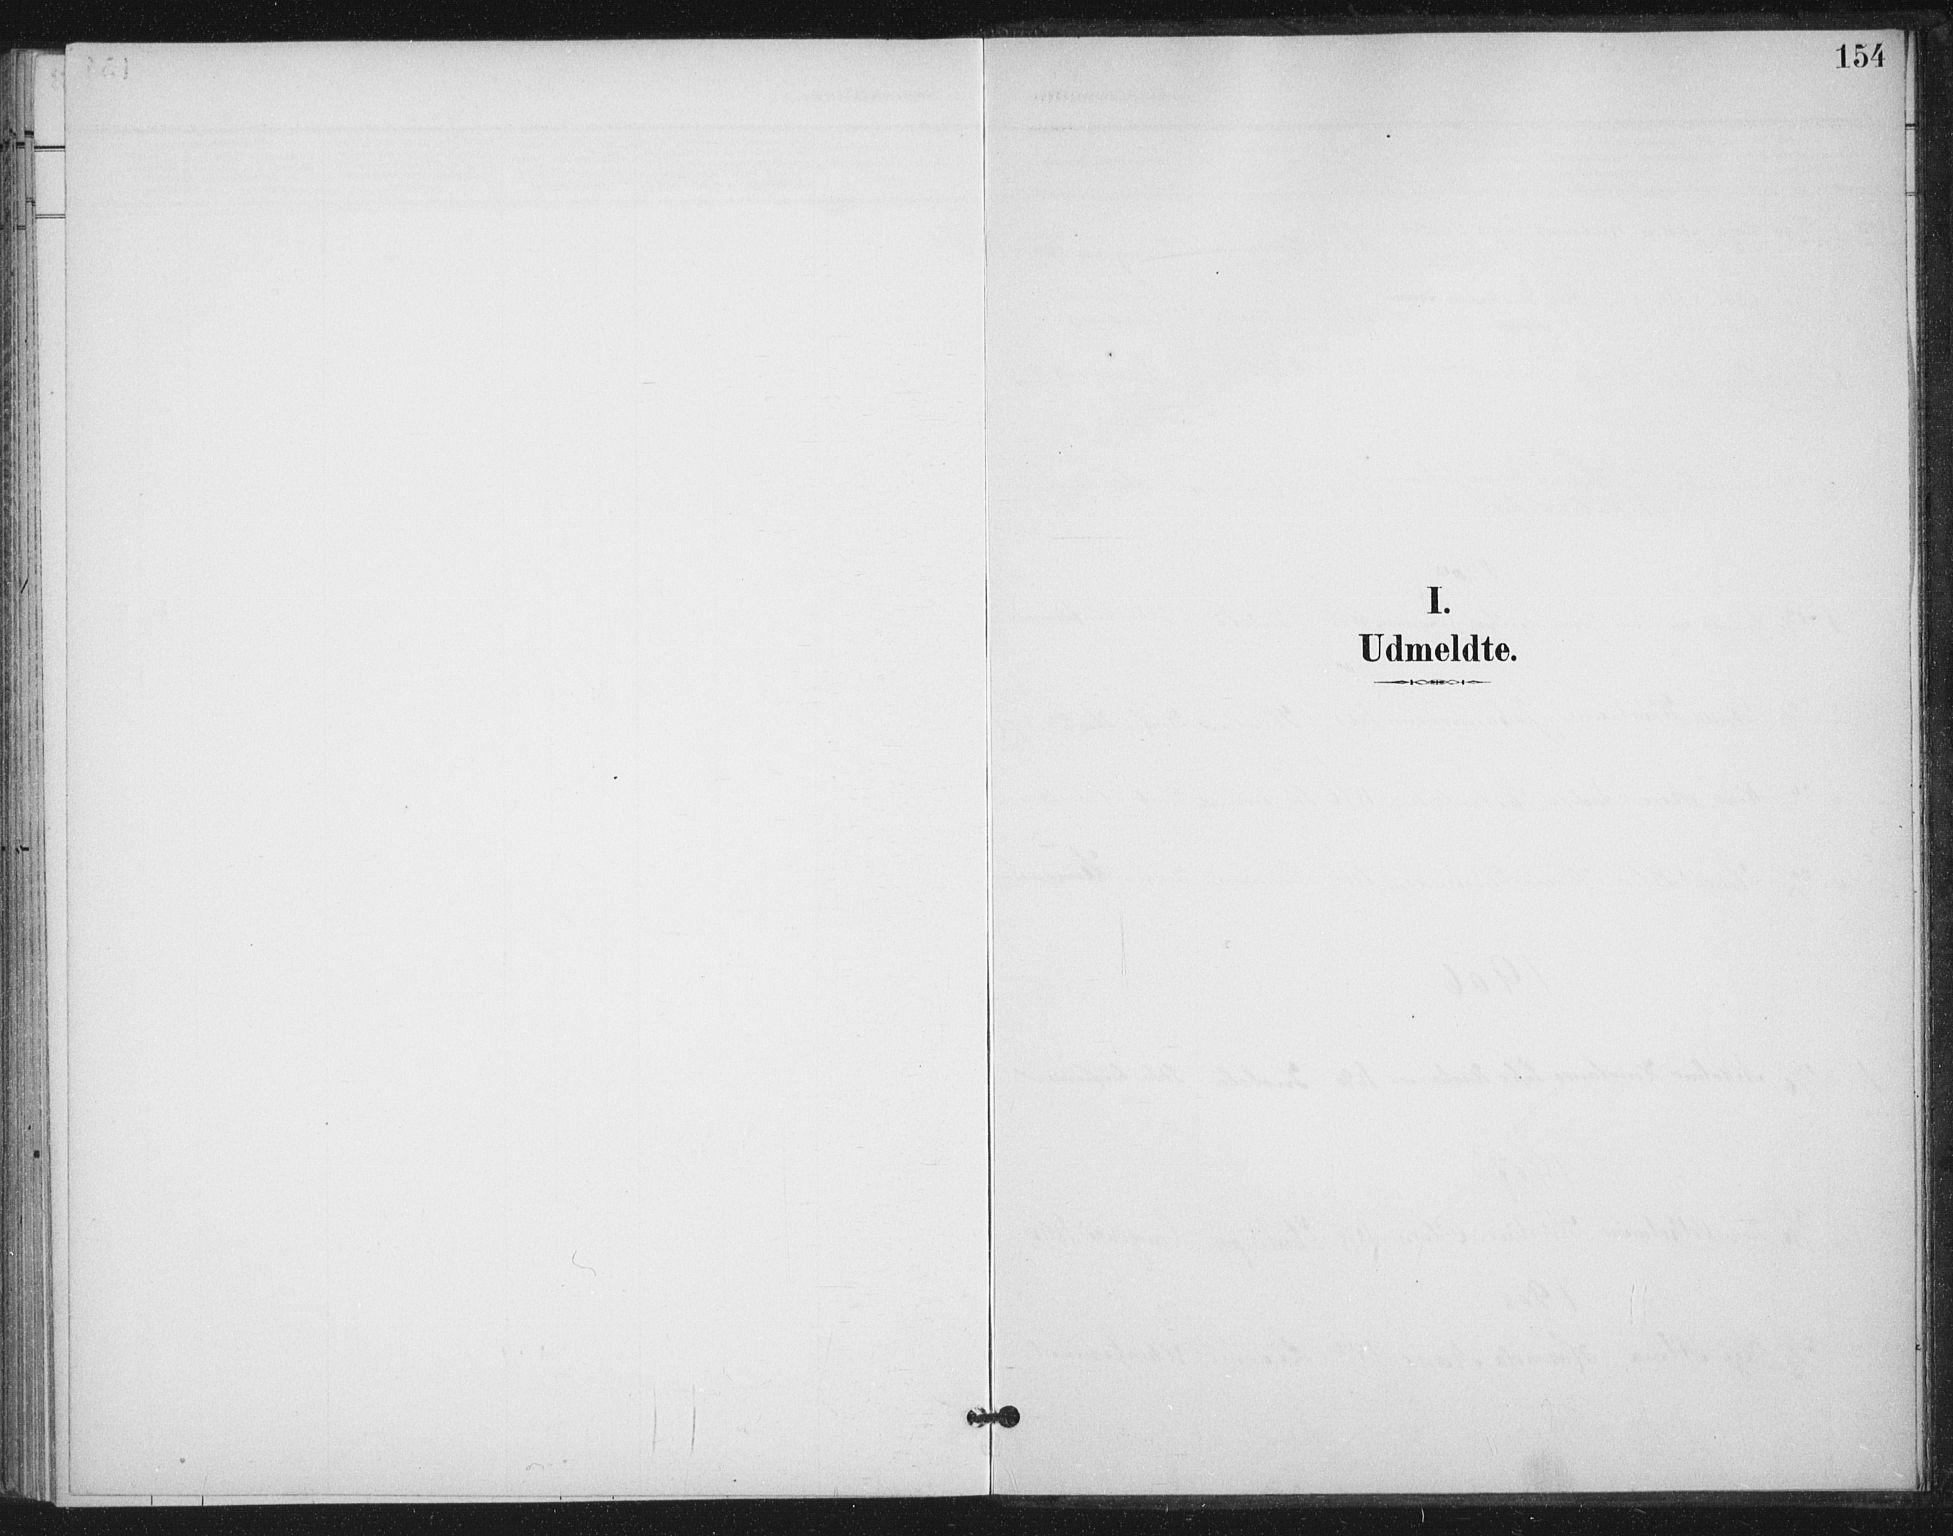 SAT, Ministerialprotokoller, klokkerbøker og fødselsregistre - Nordland, 894/L1356: Ministerialbok nr. 894A02, 1897-1914, s. 154